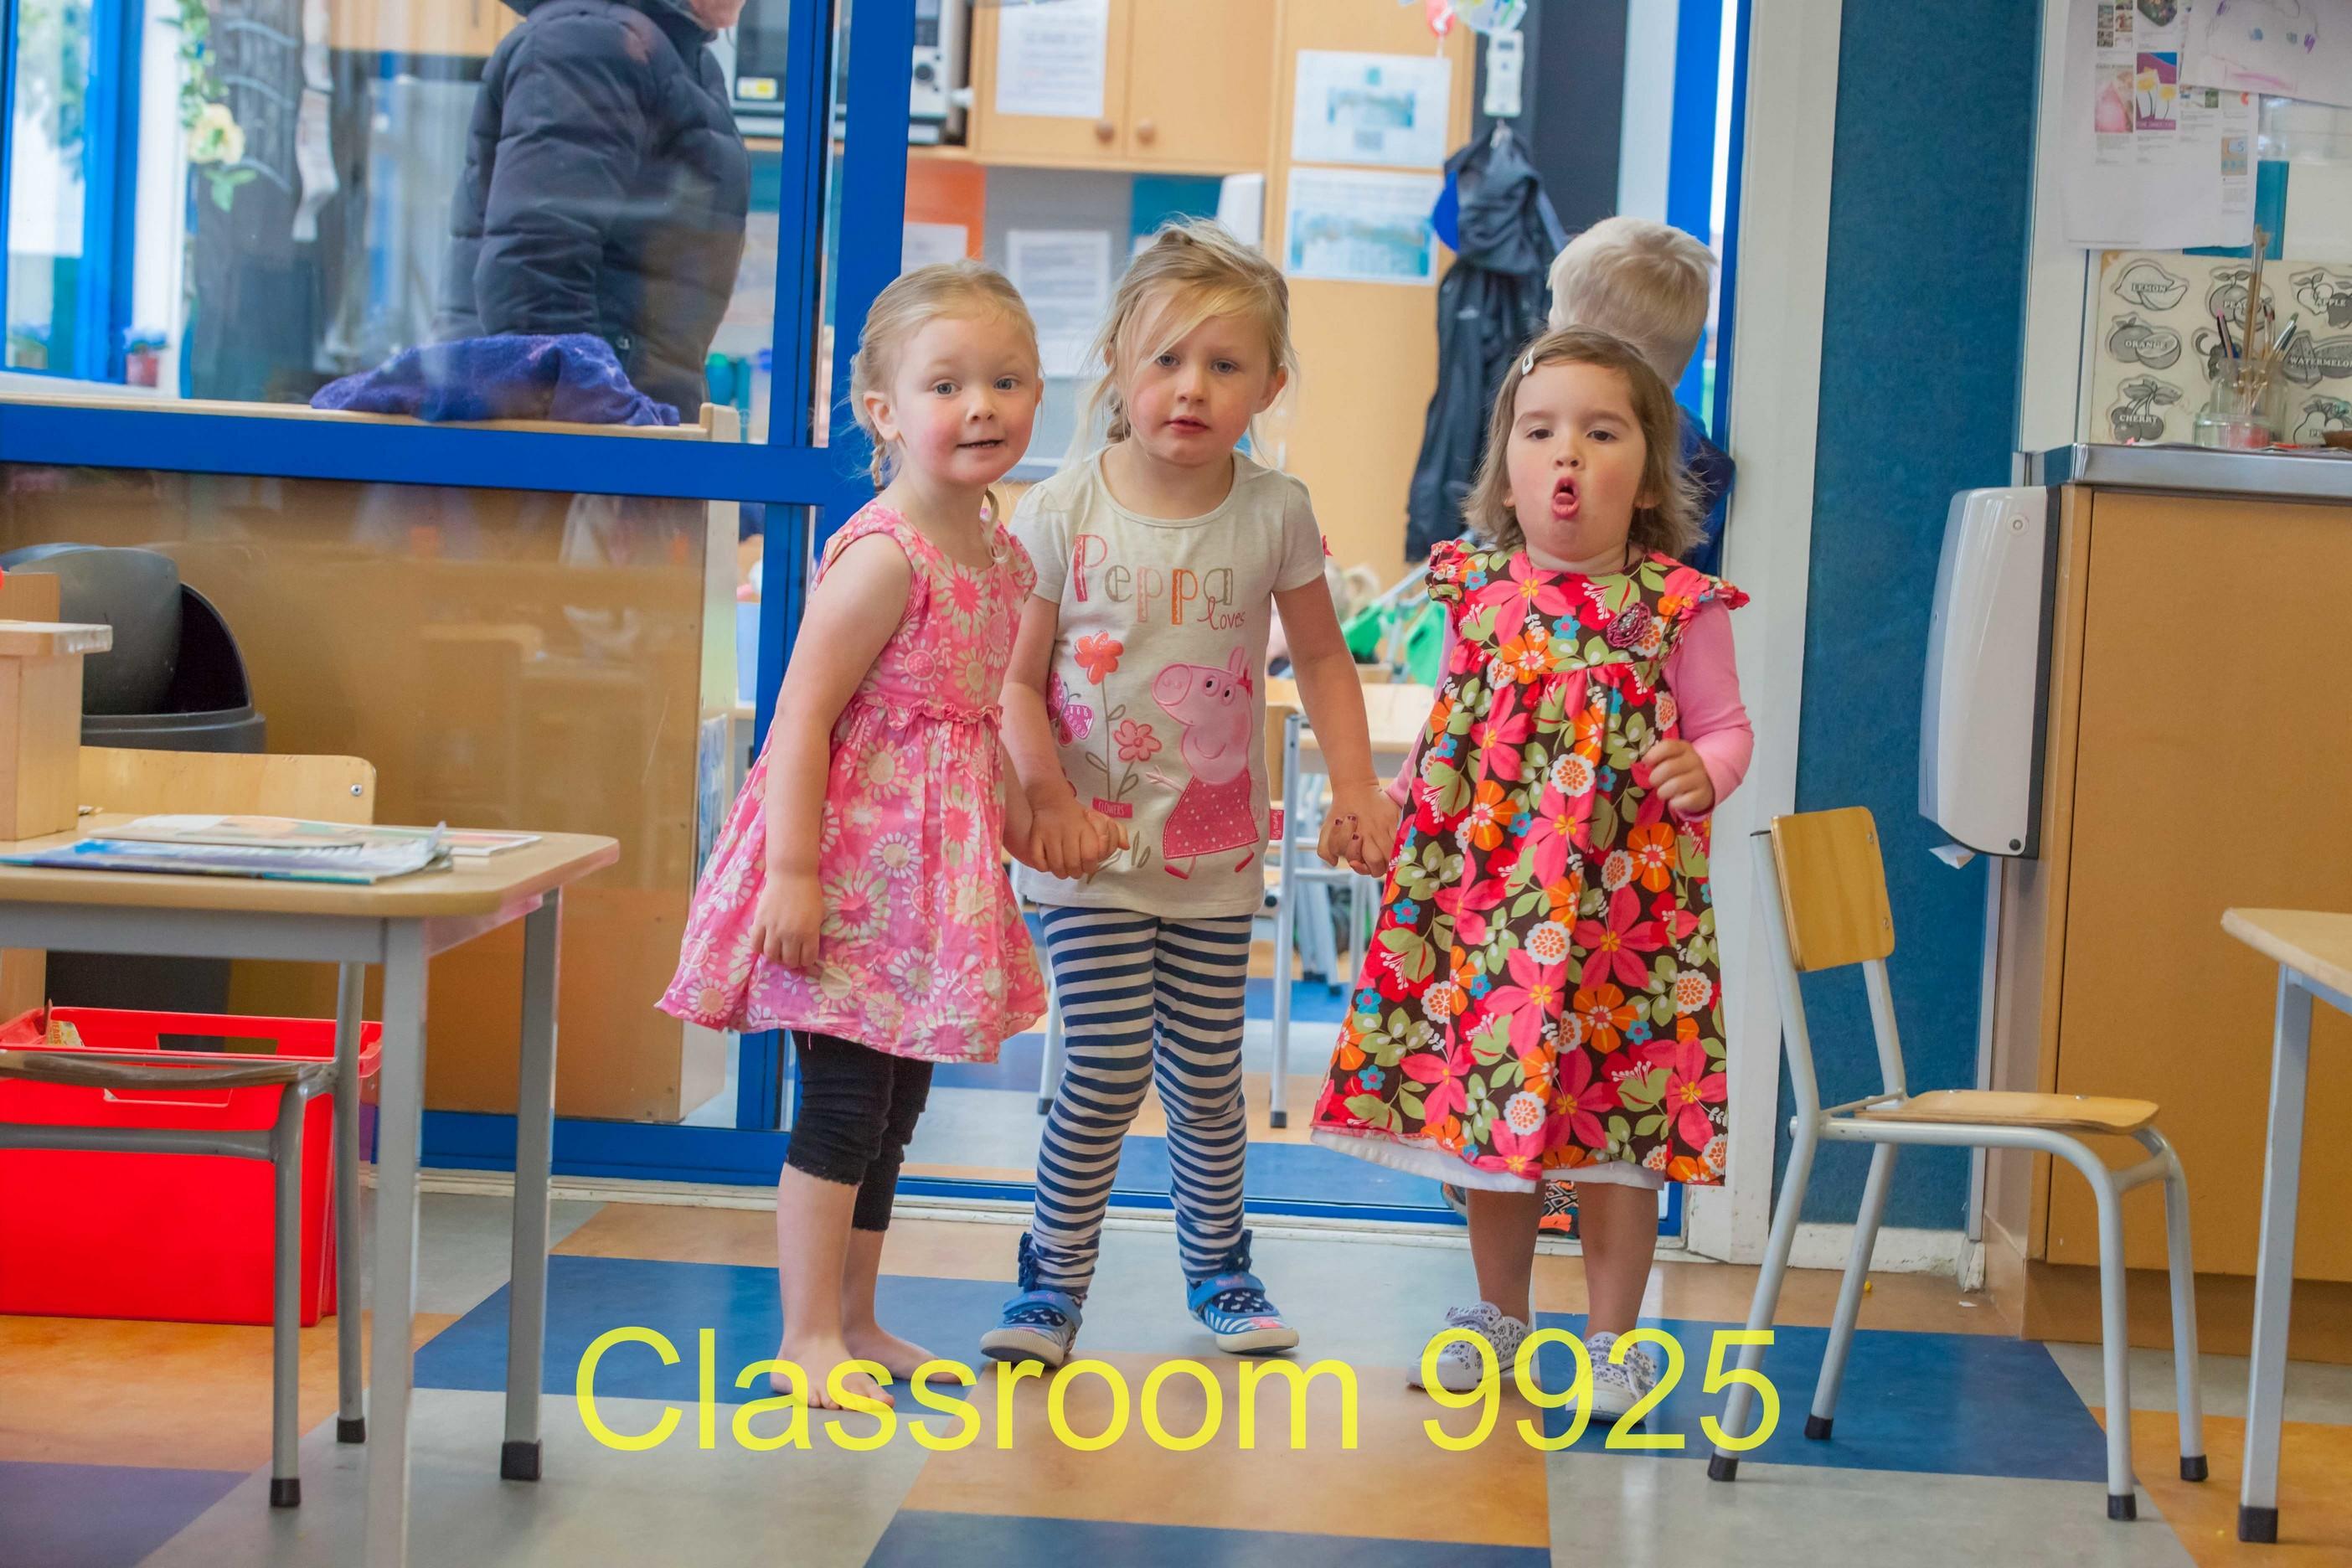 Classroom 9925